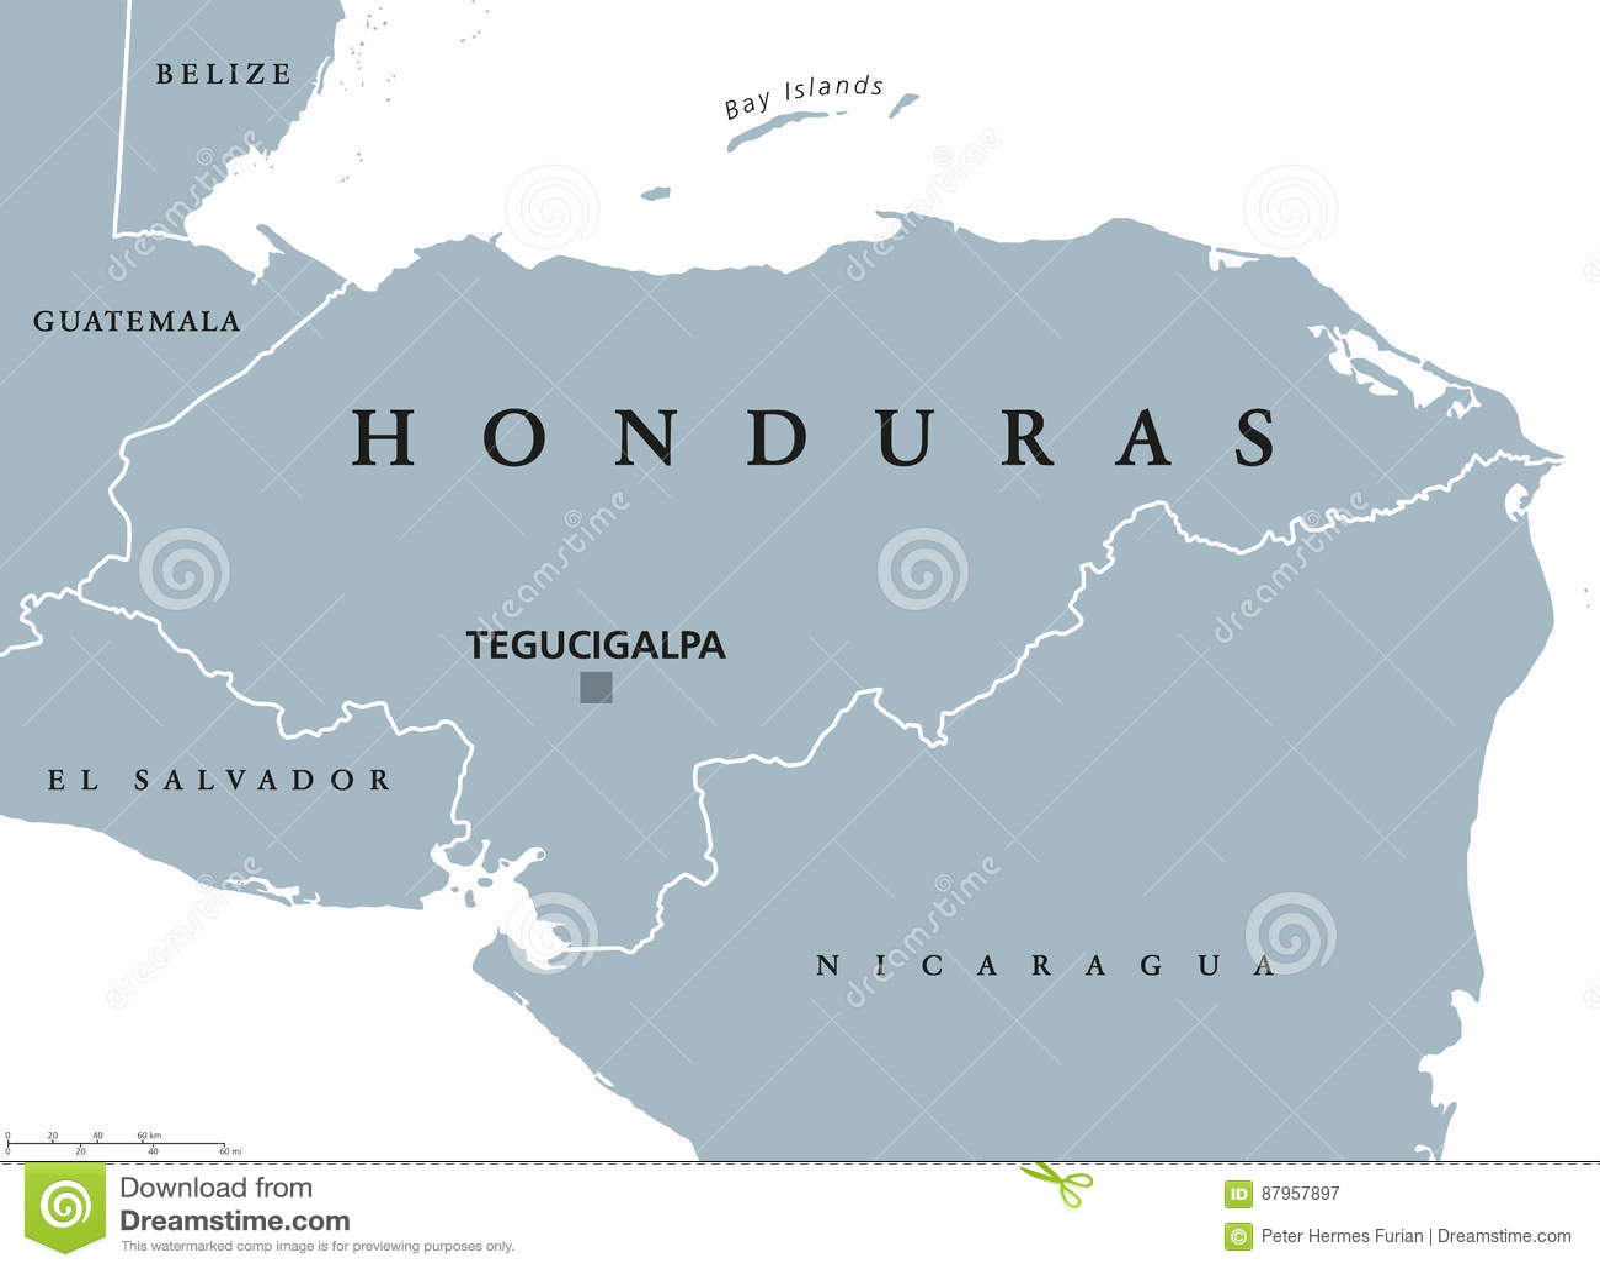 Honduras political map stock vector. Illustration of nicaragua ...